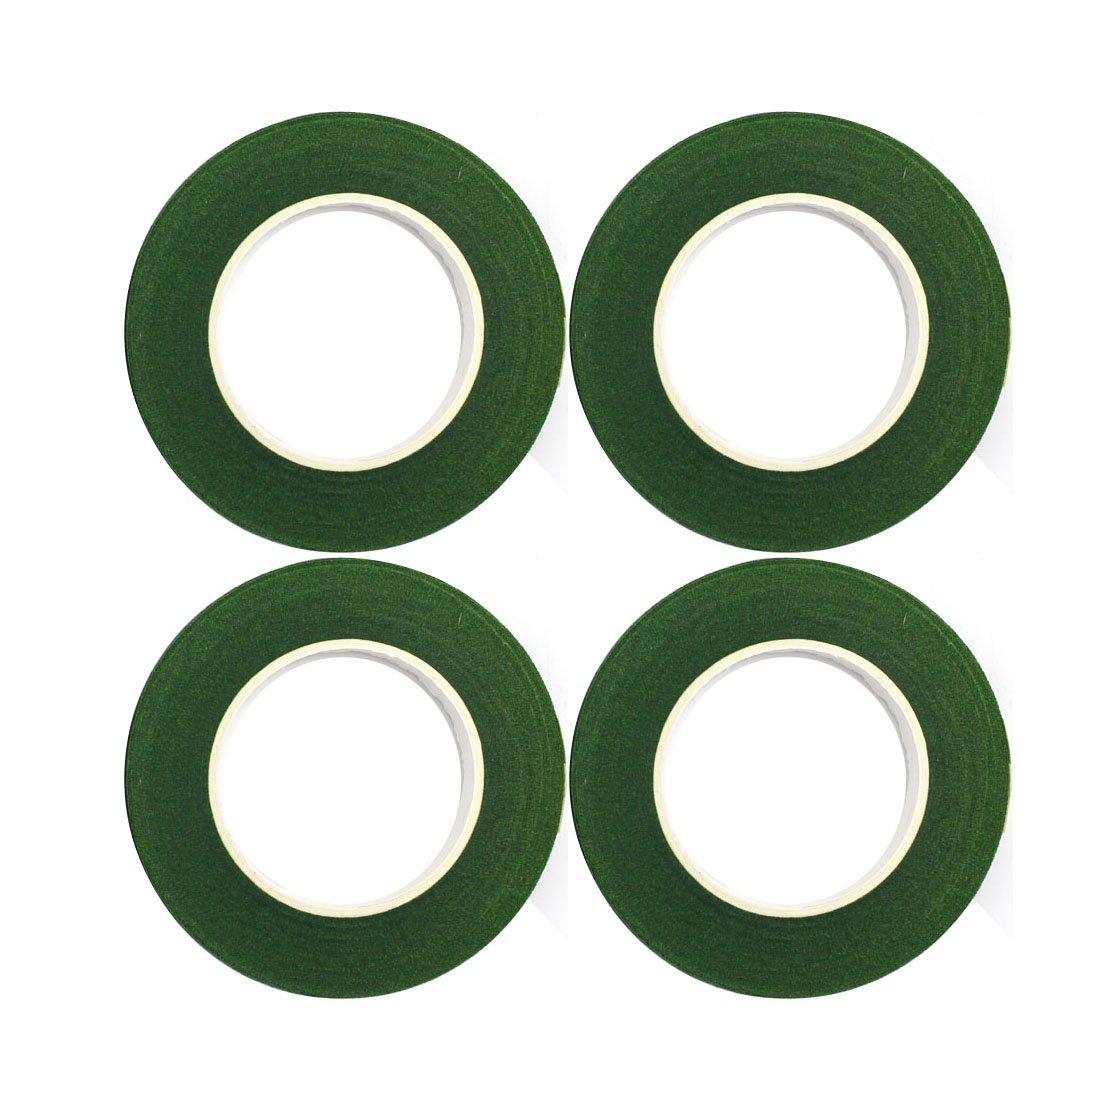 Decora 4 Rolls 1/2by 120 Yard Dark Green Floral Tape for Stem Wrap 4336861511